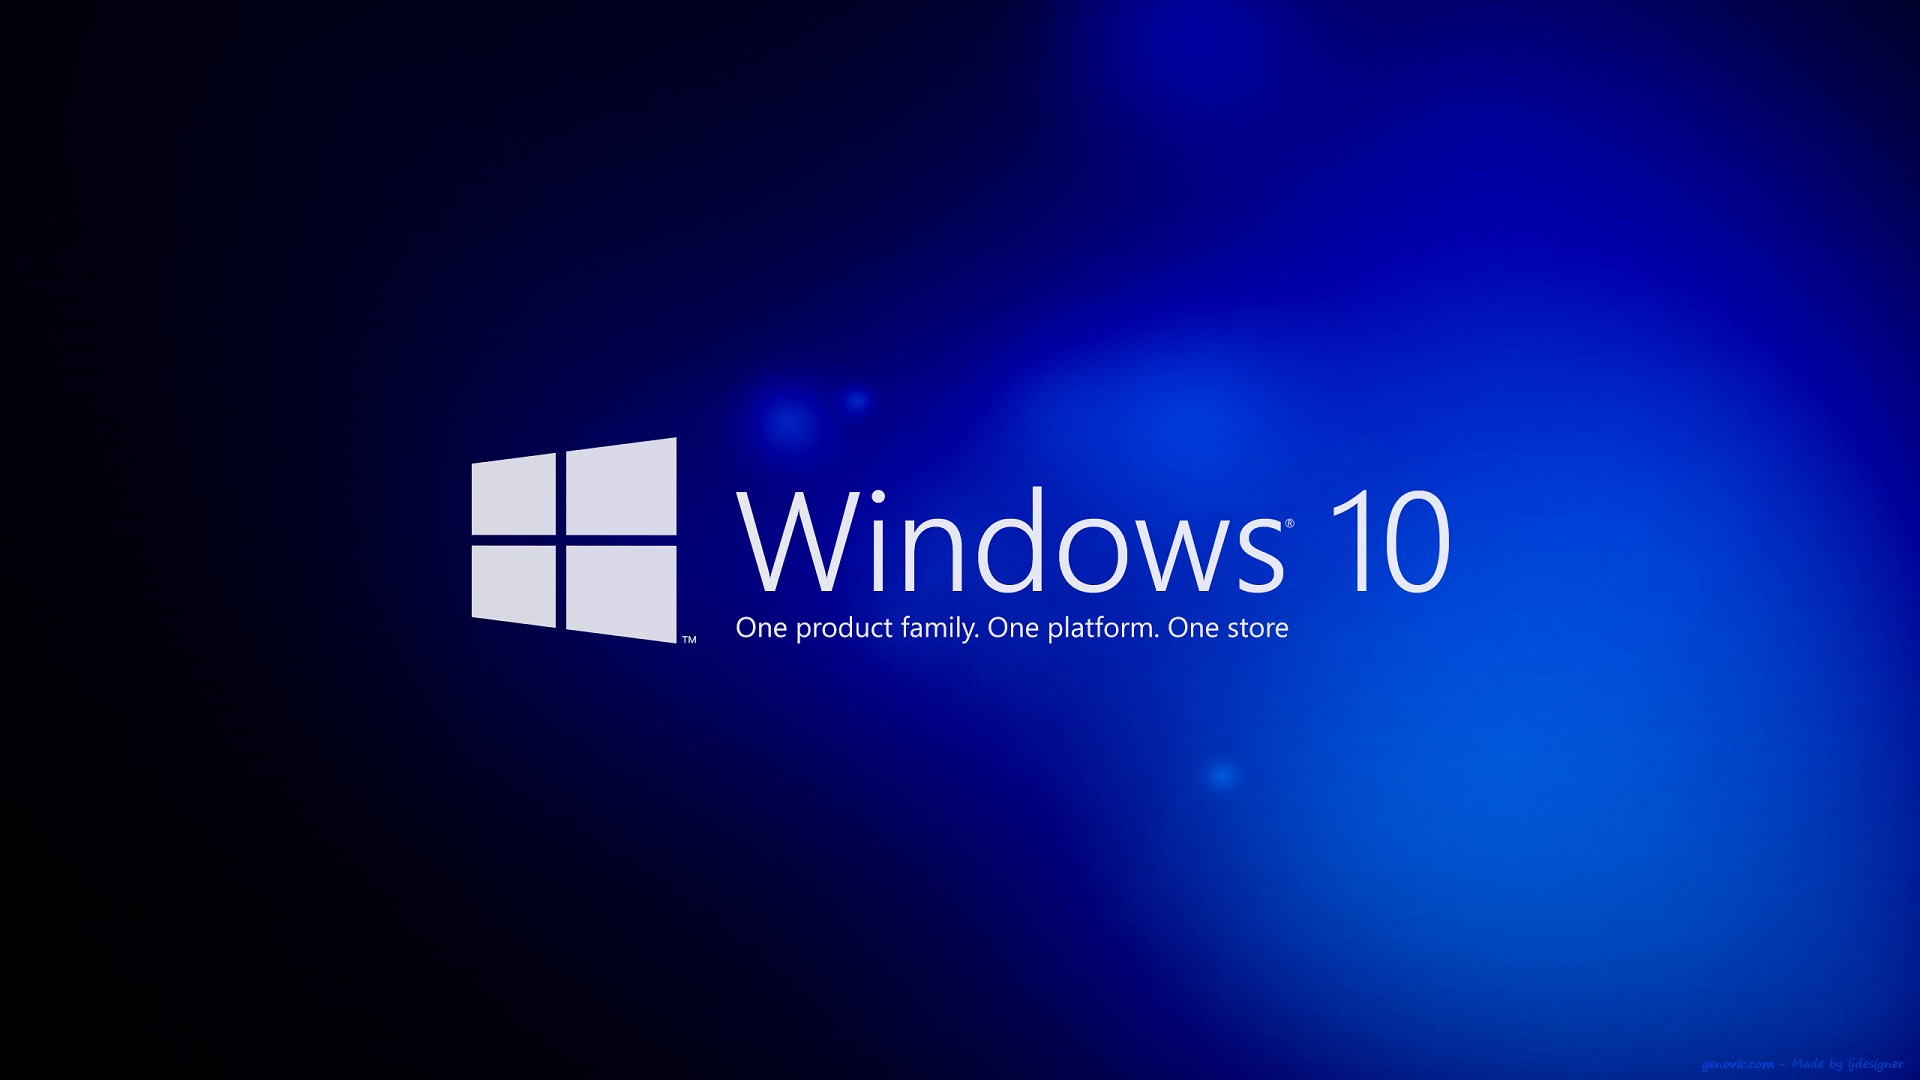 45 Shuffle Wallpaper Windows 10 On Wallpapersafari